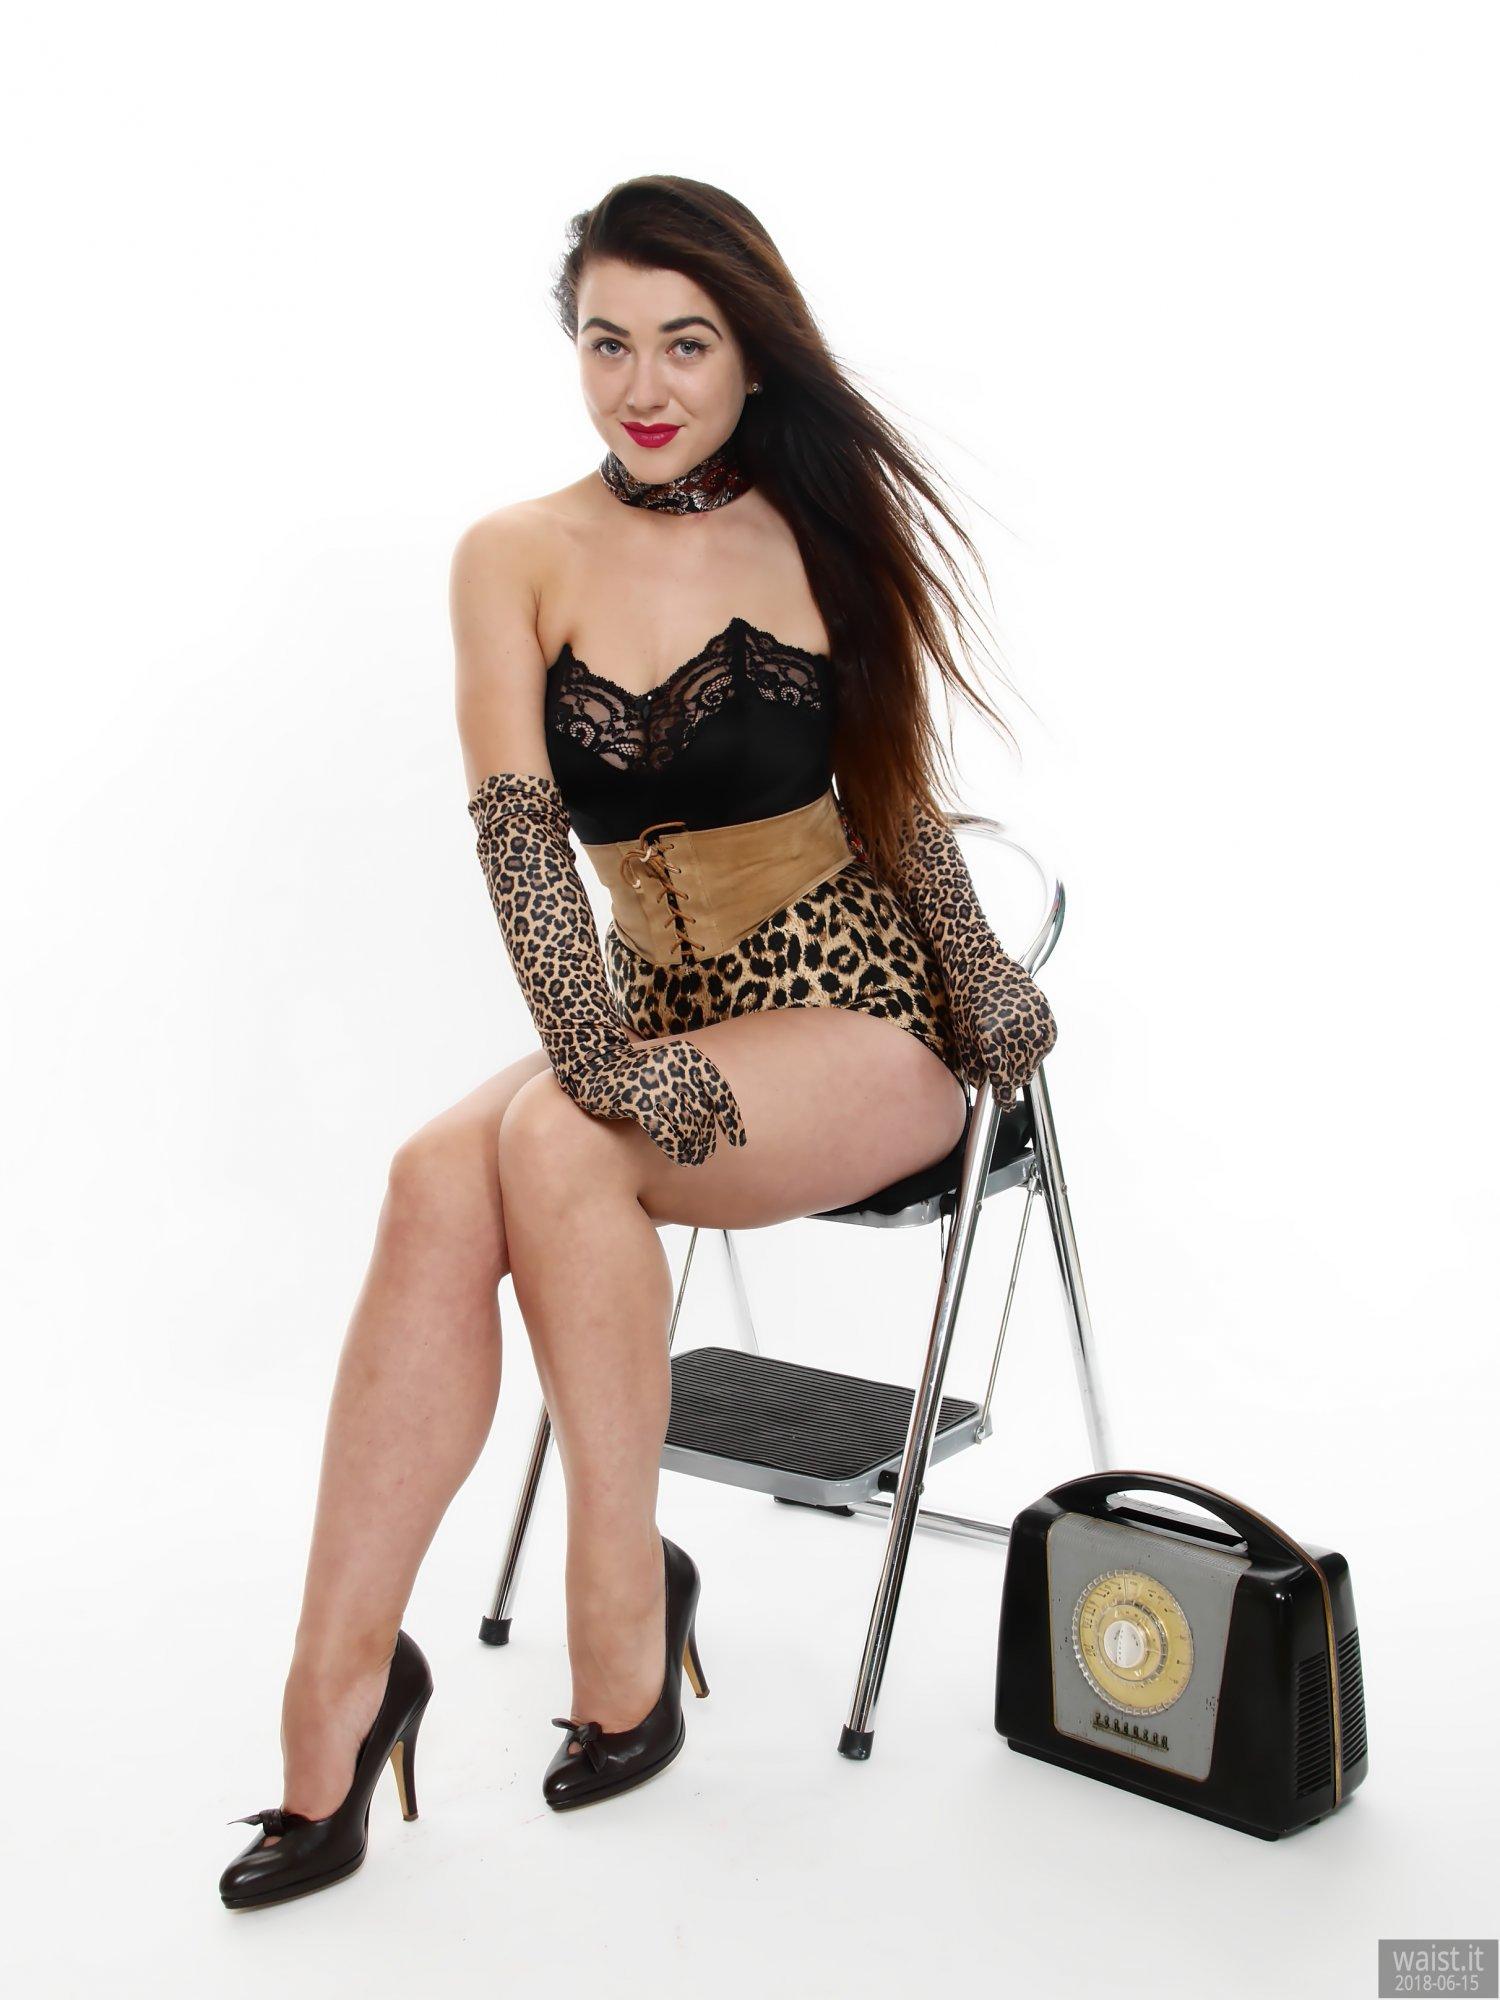 2018-06-15 Tatjana Bastet in black strapless longline bra top and leopard-print Beauform pantie girdle worn as hotpants, c/w tight leather corset-belt